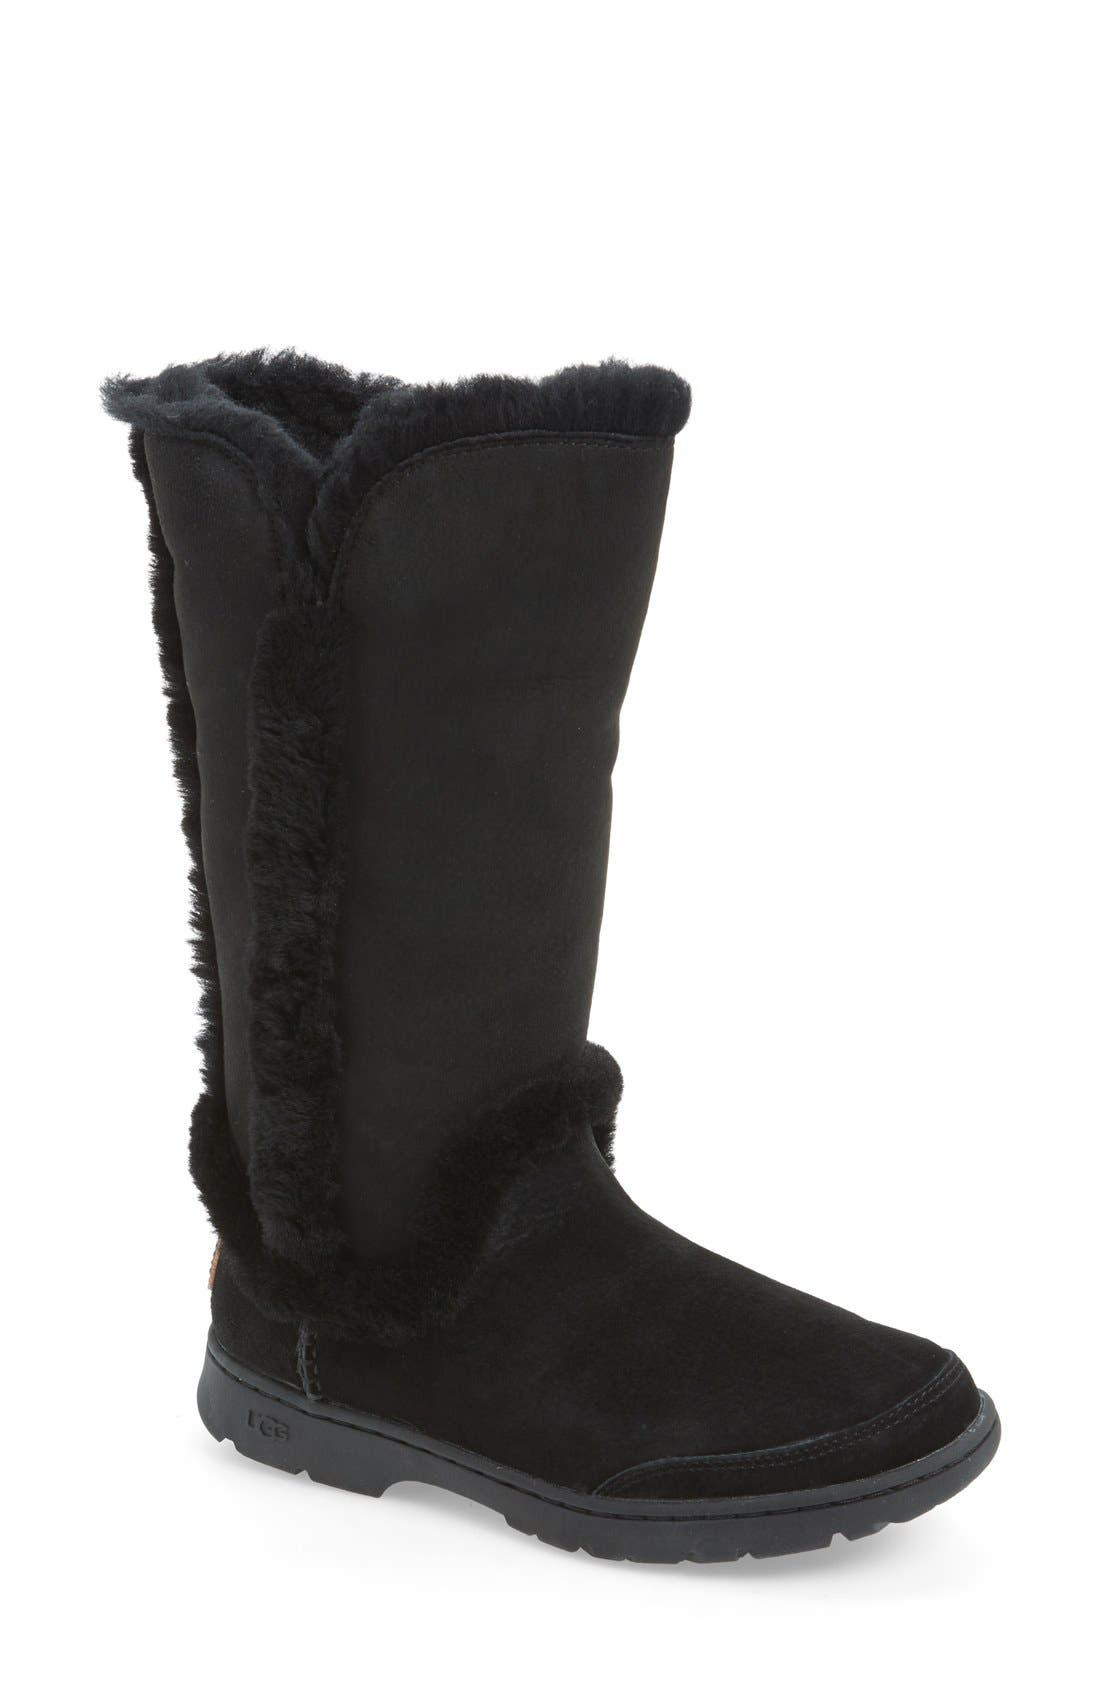 Main Image - UGG® Katia Waterproof Tall Boot (Women)